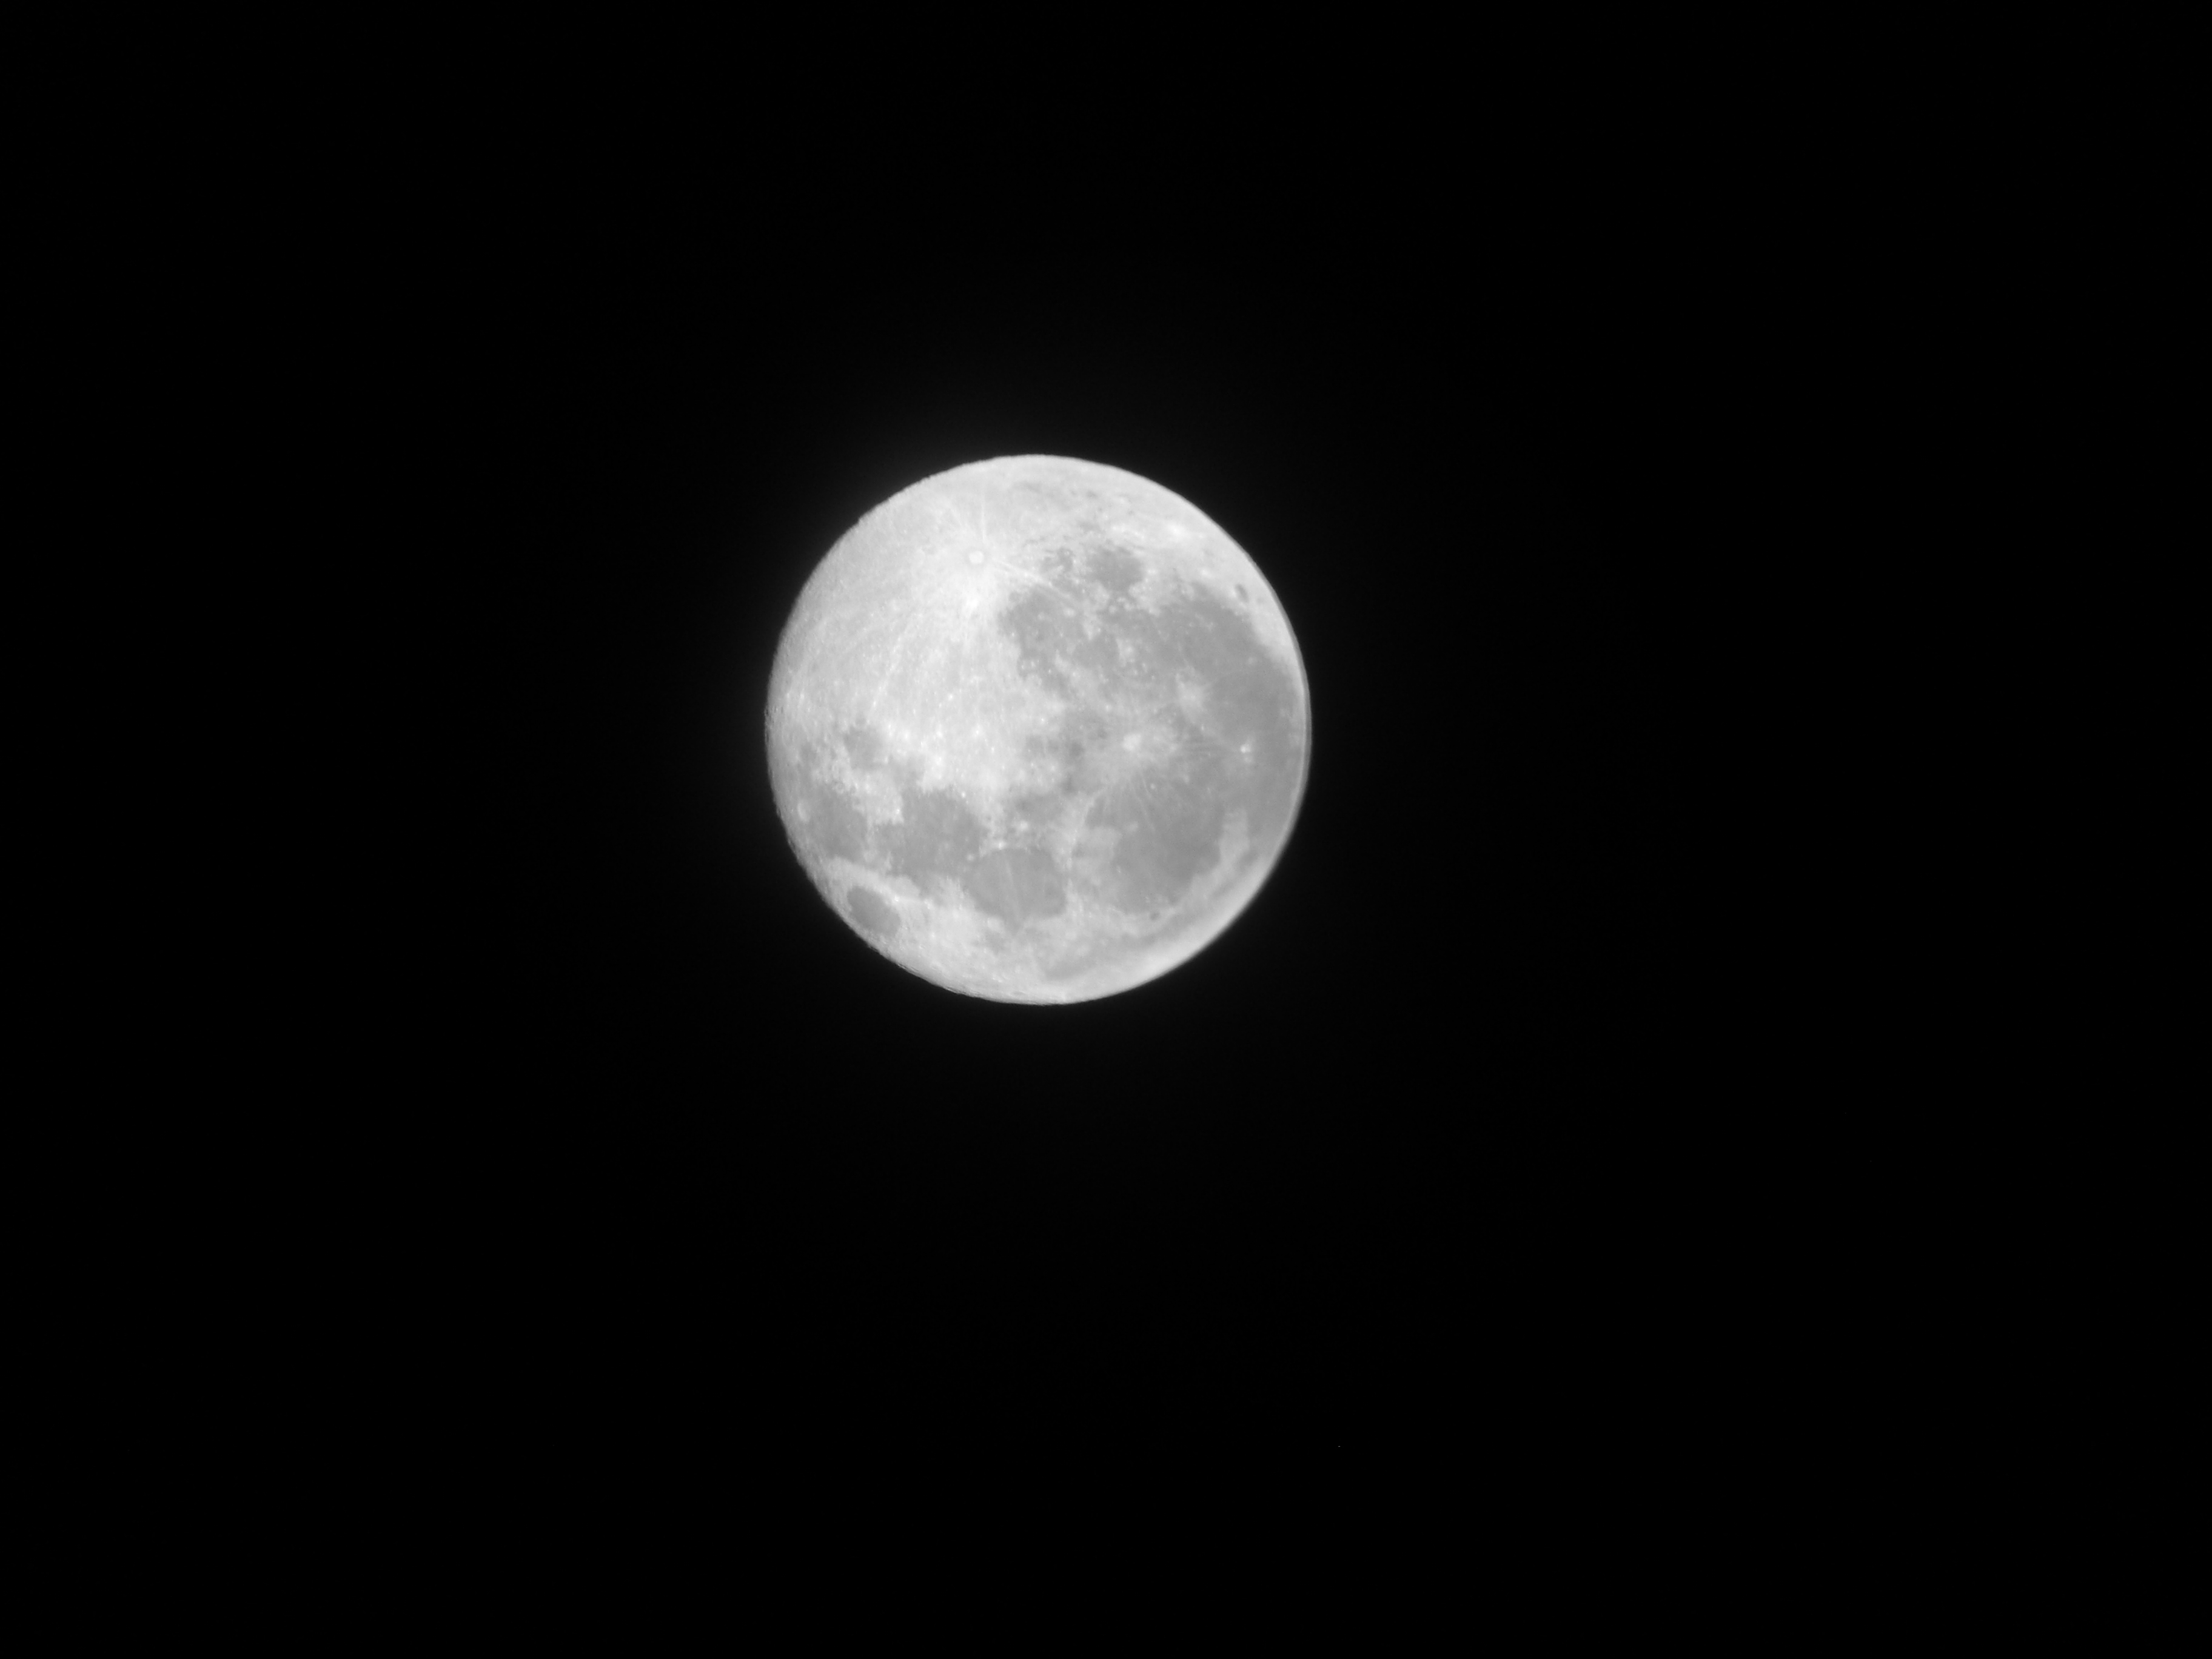 Full Moon, Full, Lunar, Moon, Planet, HQ Photo